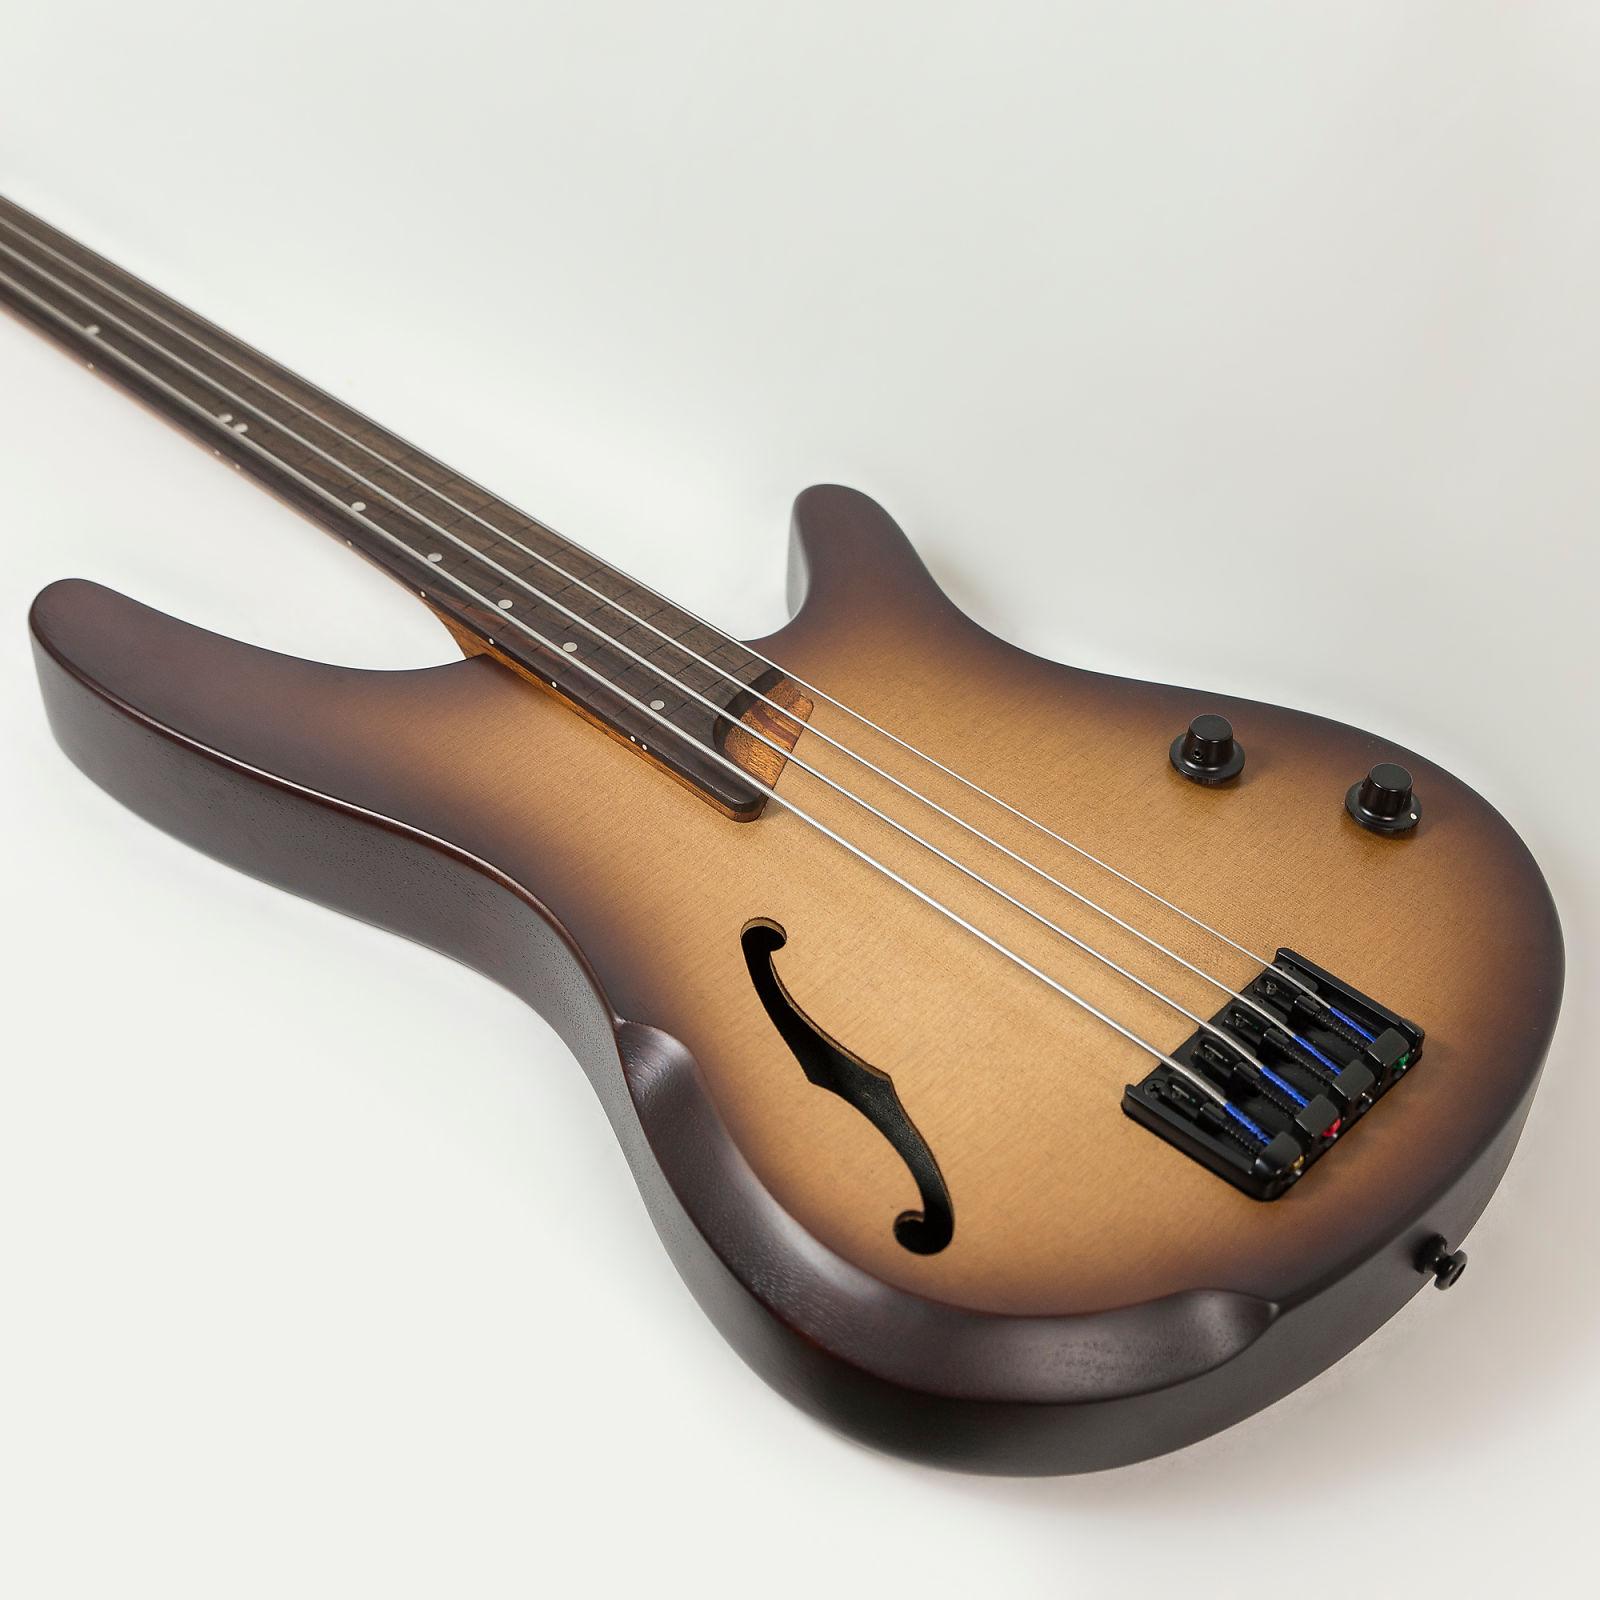 ibanez srh500f fretless 4 string semi hollow body bass guitar in natural browned burst flat. Black Bedroom Furniture Sets. Home Design Ideas